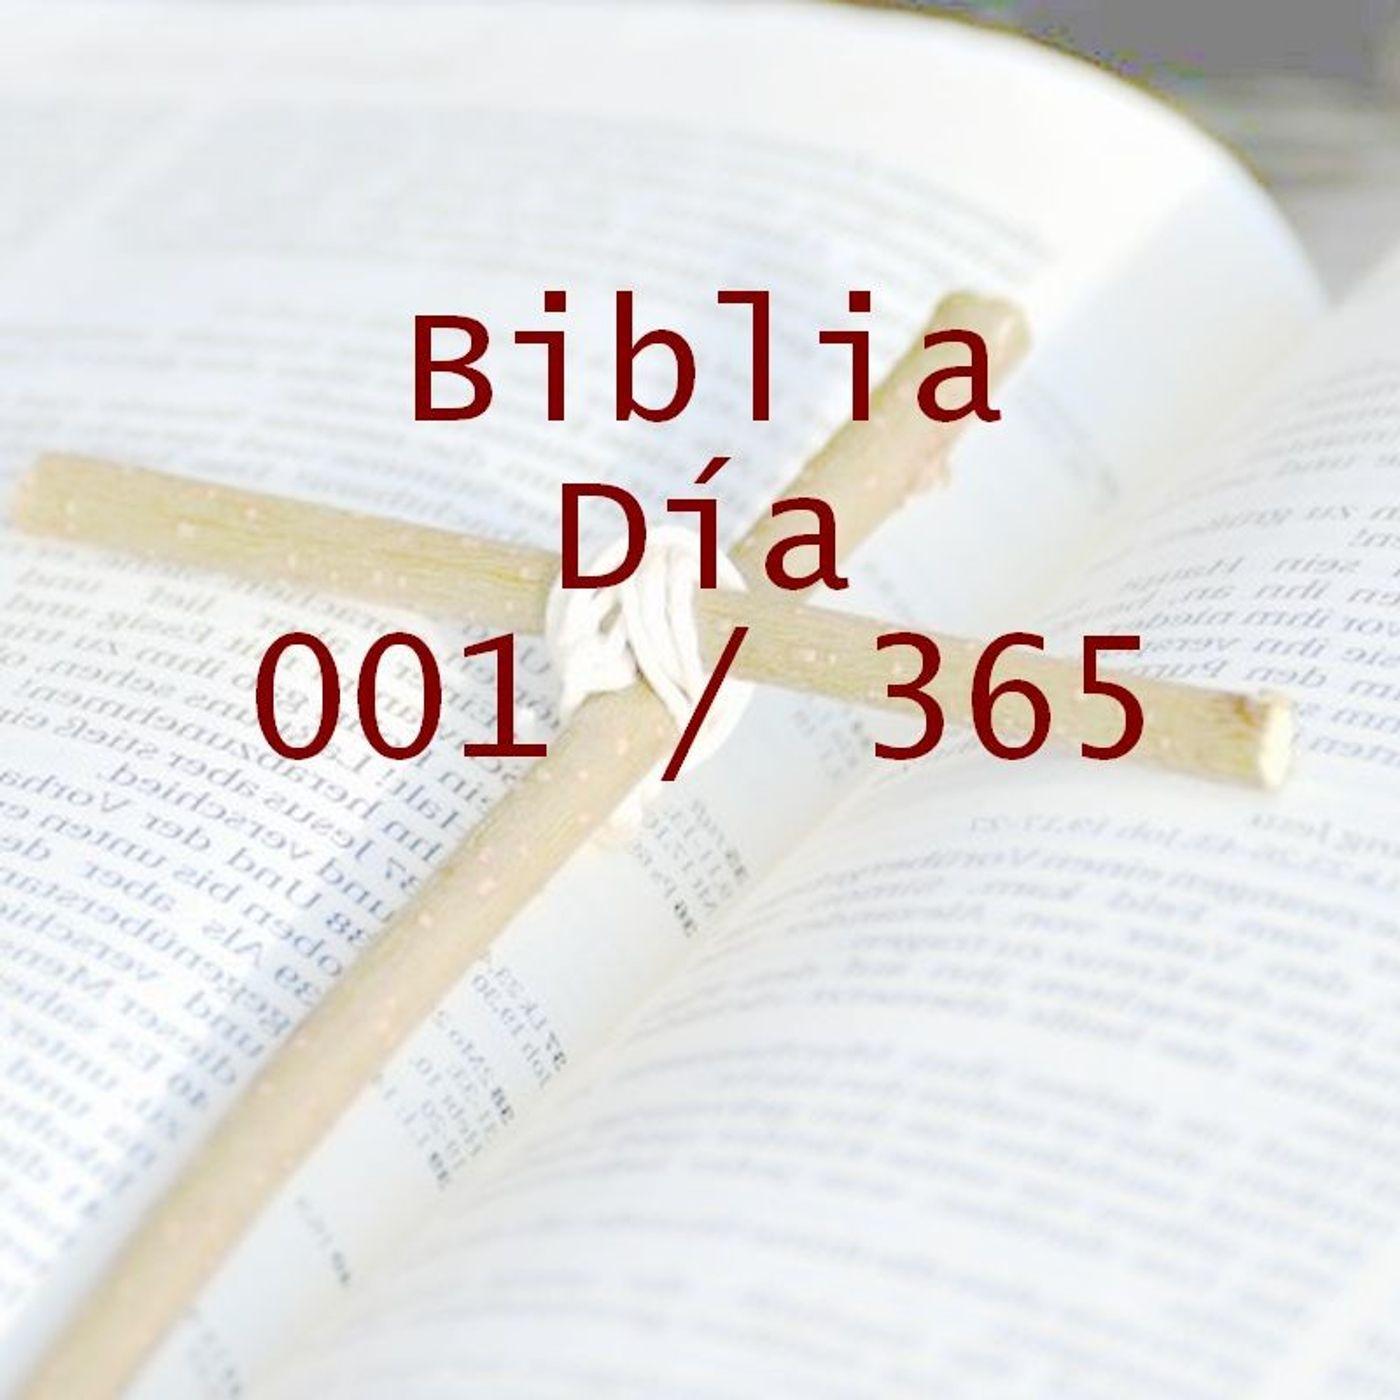 365 dias para la Biblia - Dia 001